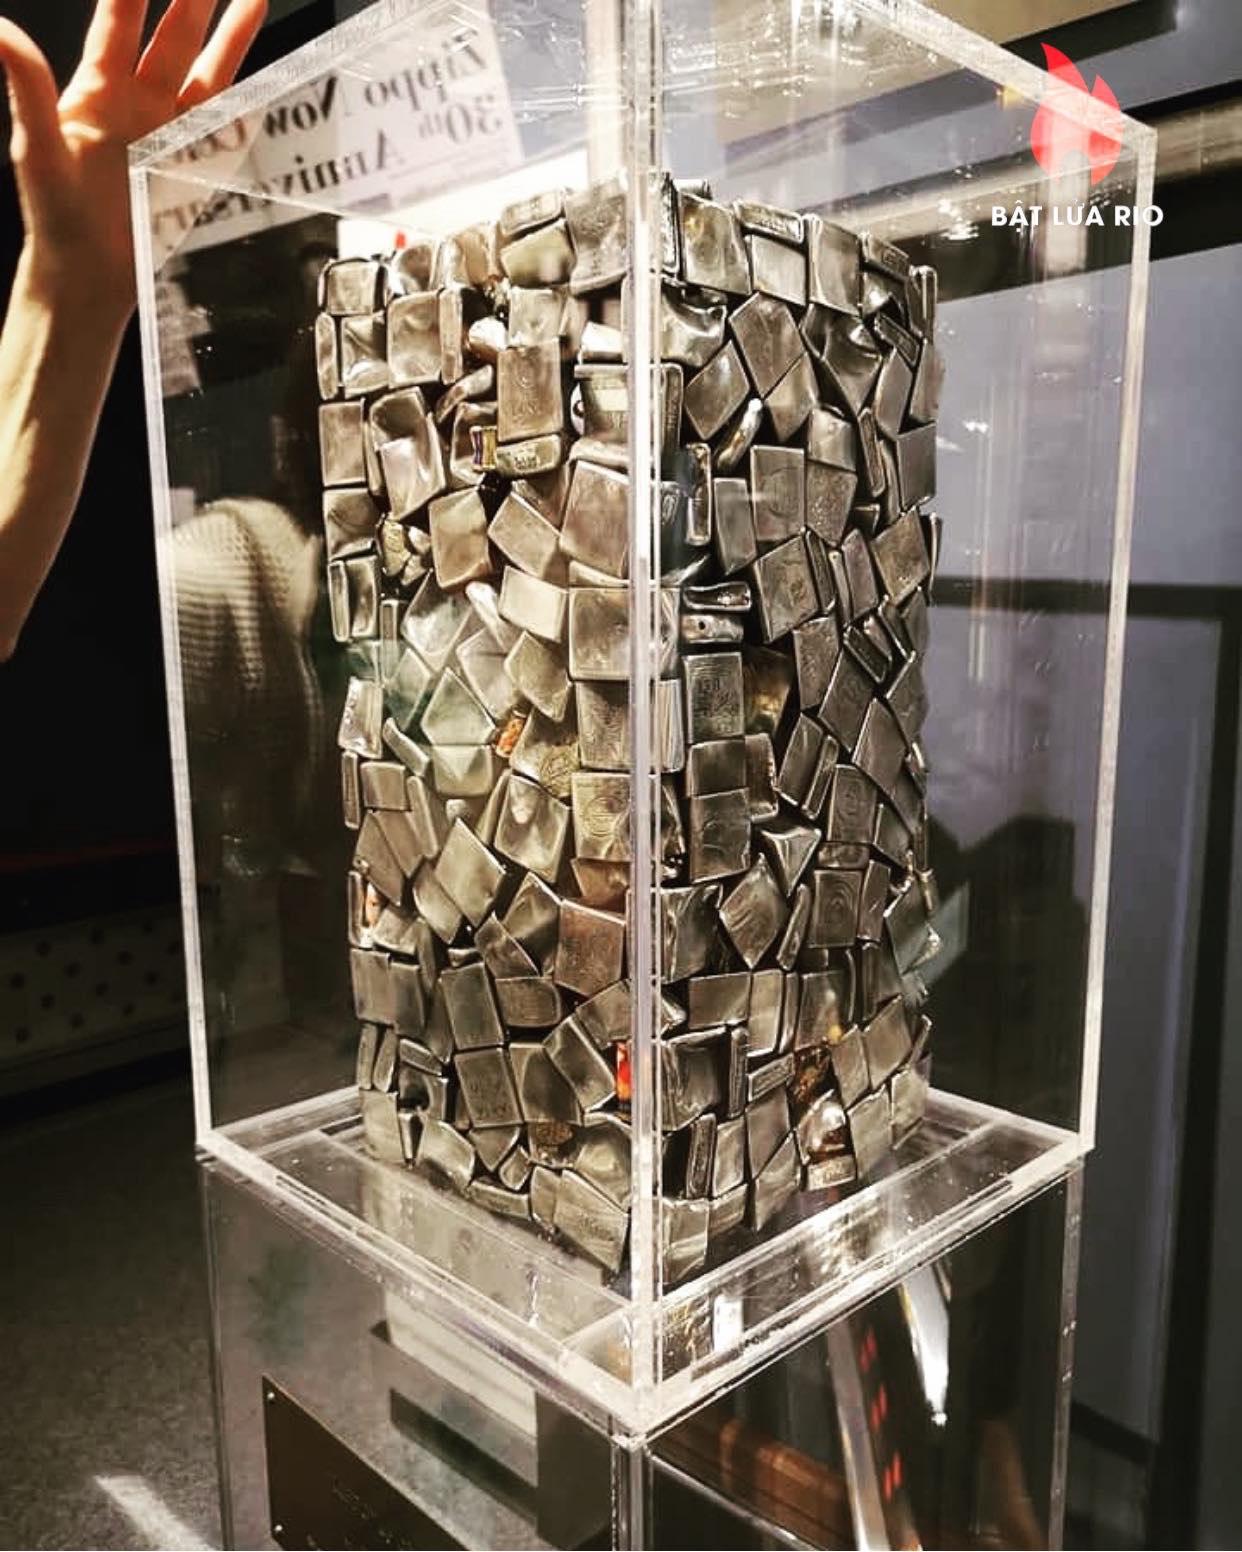 THAM QUAN BẢO TÀNG ZIPPO/CASE - ZIPPO/CASE MUSEUM 46